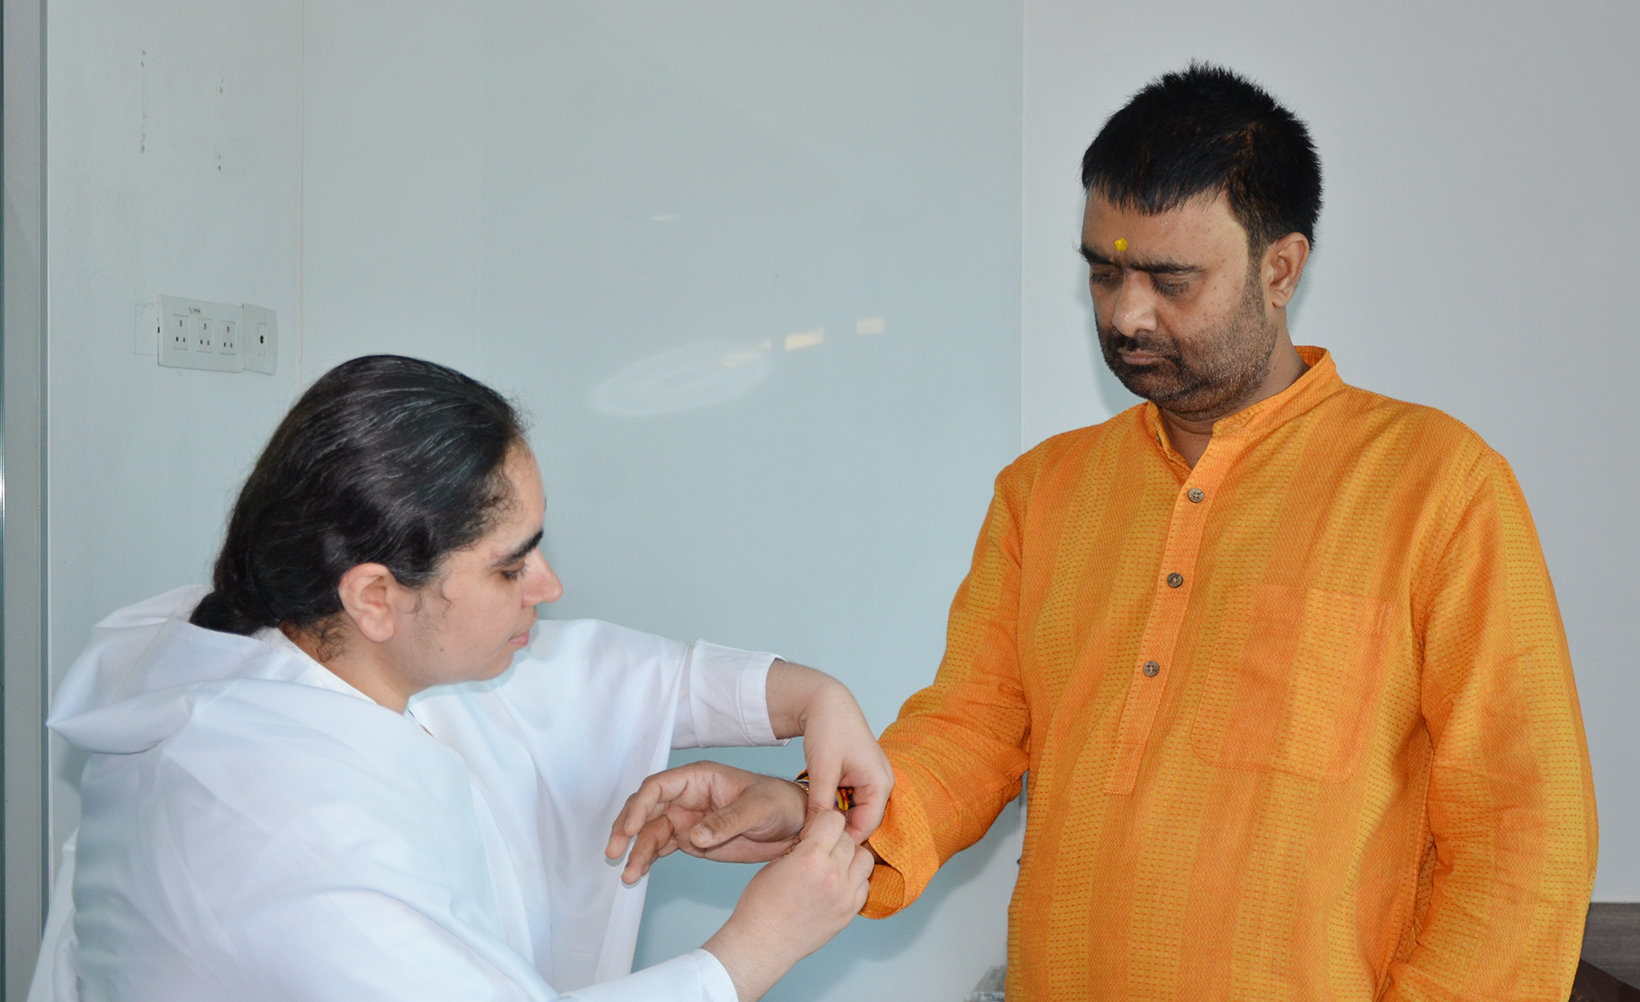 BK Aditi ties Rakhi to Deepak Churasiya - Senior Anchor News Nation Channel